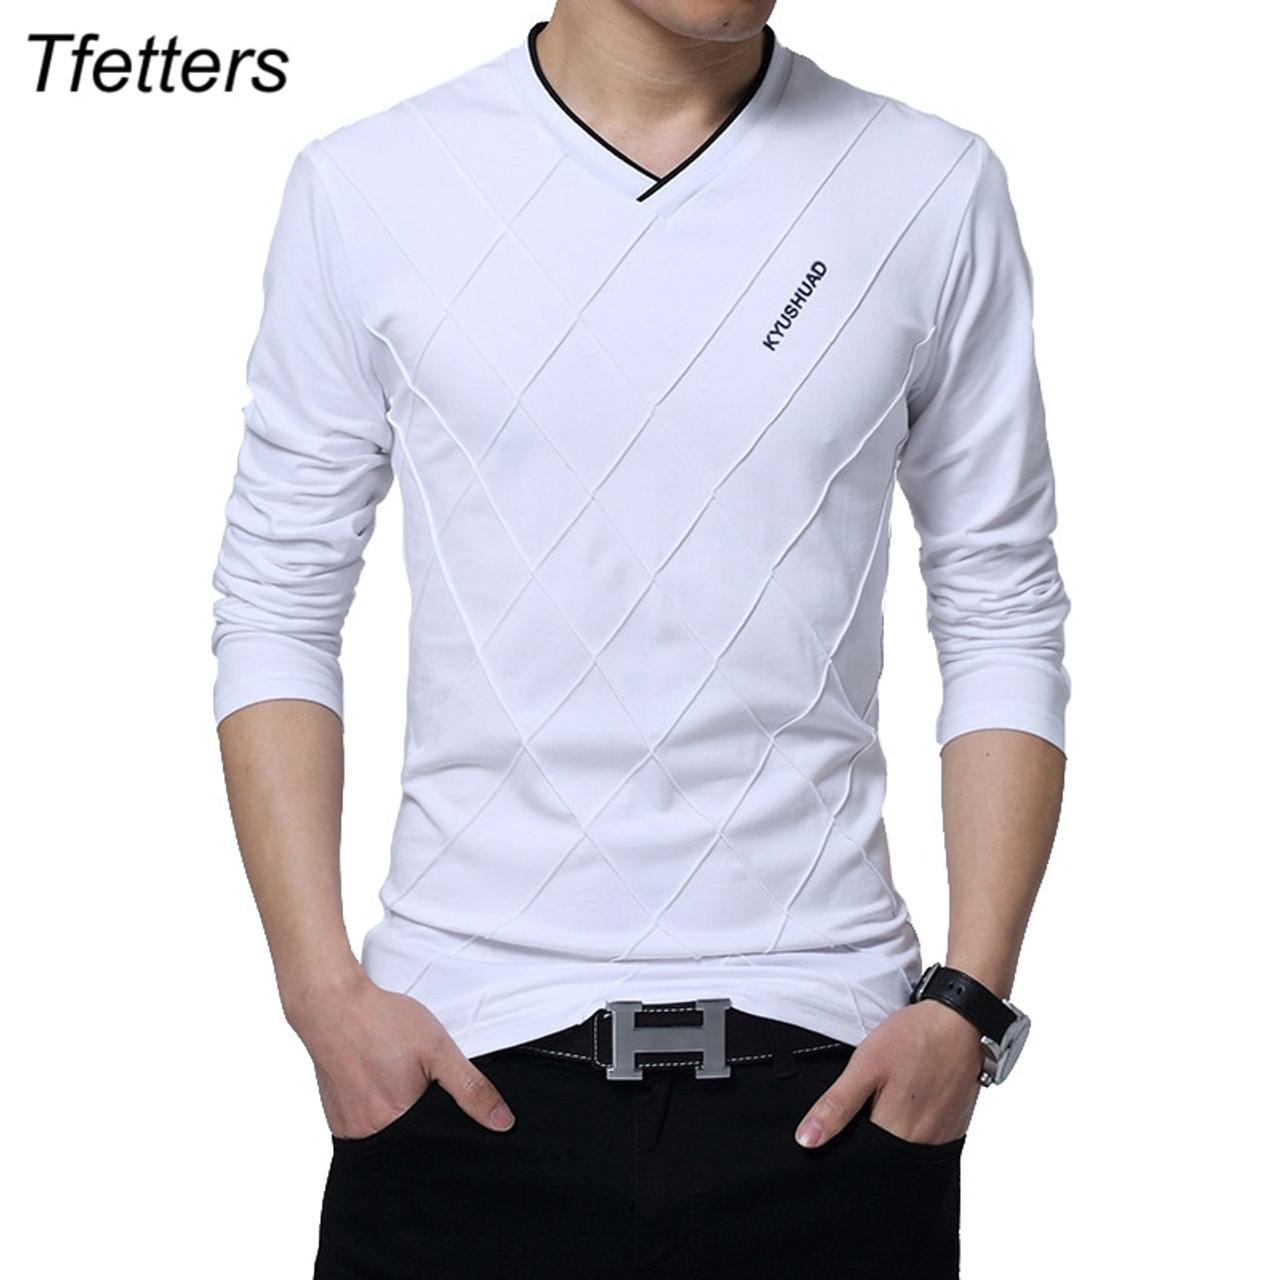 Tfetters Fashion Men T Shirt Slim Fit Custom T Shirt Crease Design Long Stylish Luxury V Neck Fitness T Shirt Tee Shirt Homme Onshopdeals Com